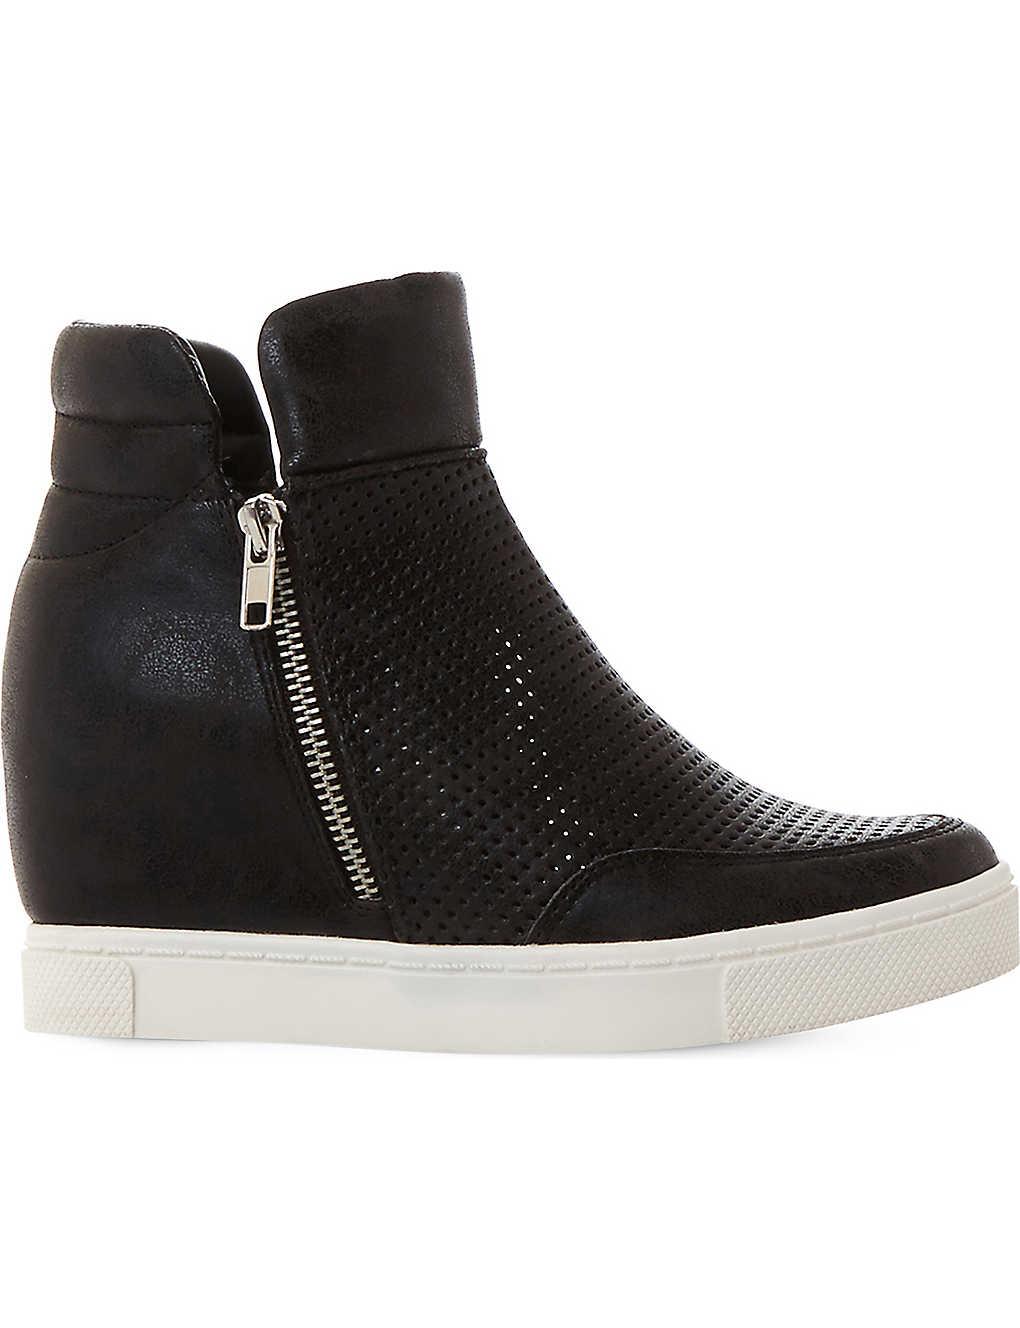 6cc76ef38b8 STEVE MADDEN - Hidden perforated wedge sneakers